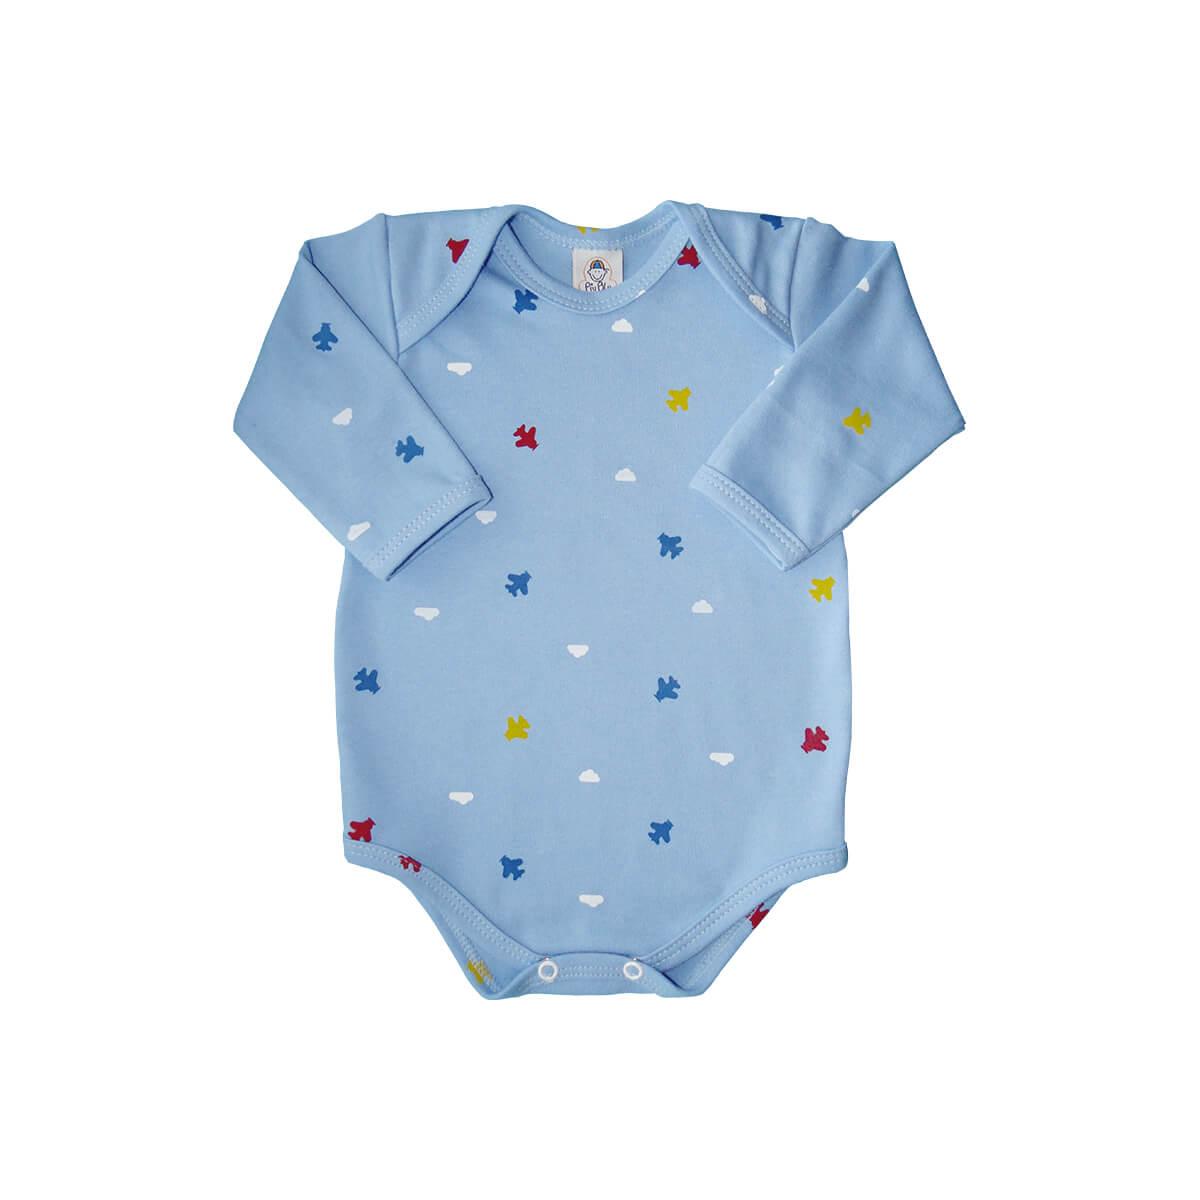 Body Manga Longa Aviãozinho Azul Bebê